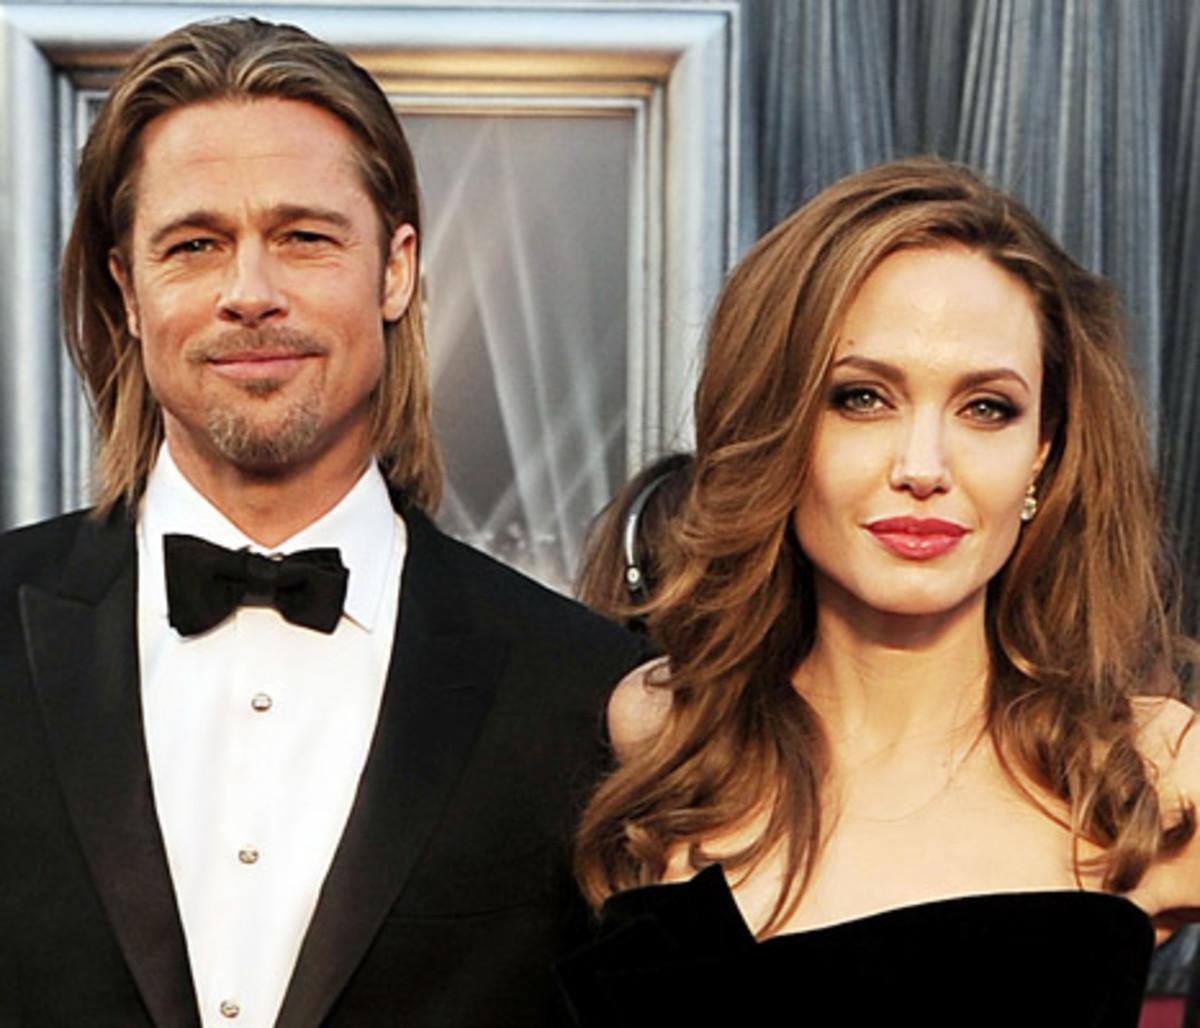 Brad Pitt (52) and wife Angelina Jolie (40)